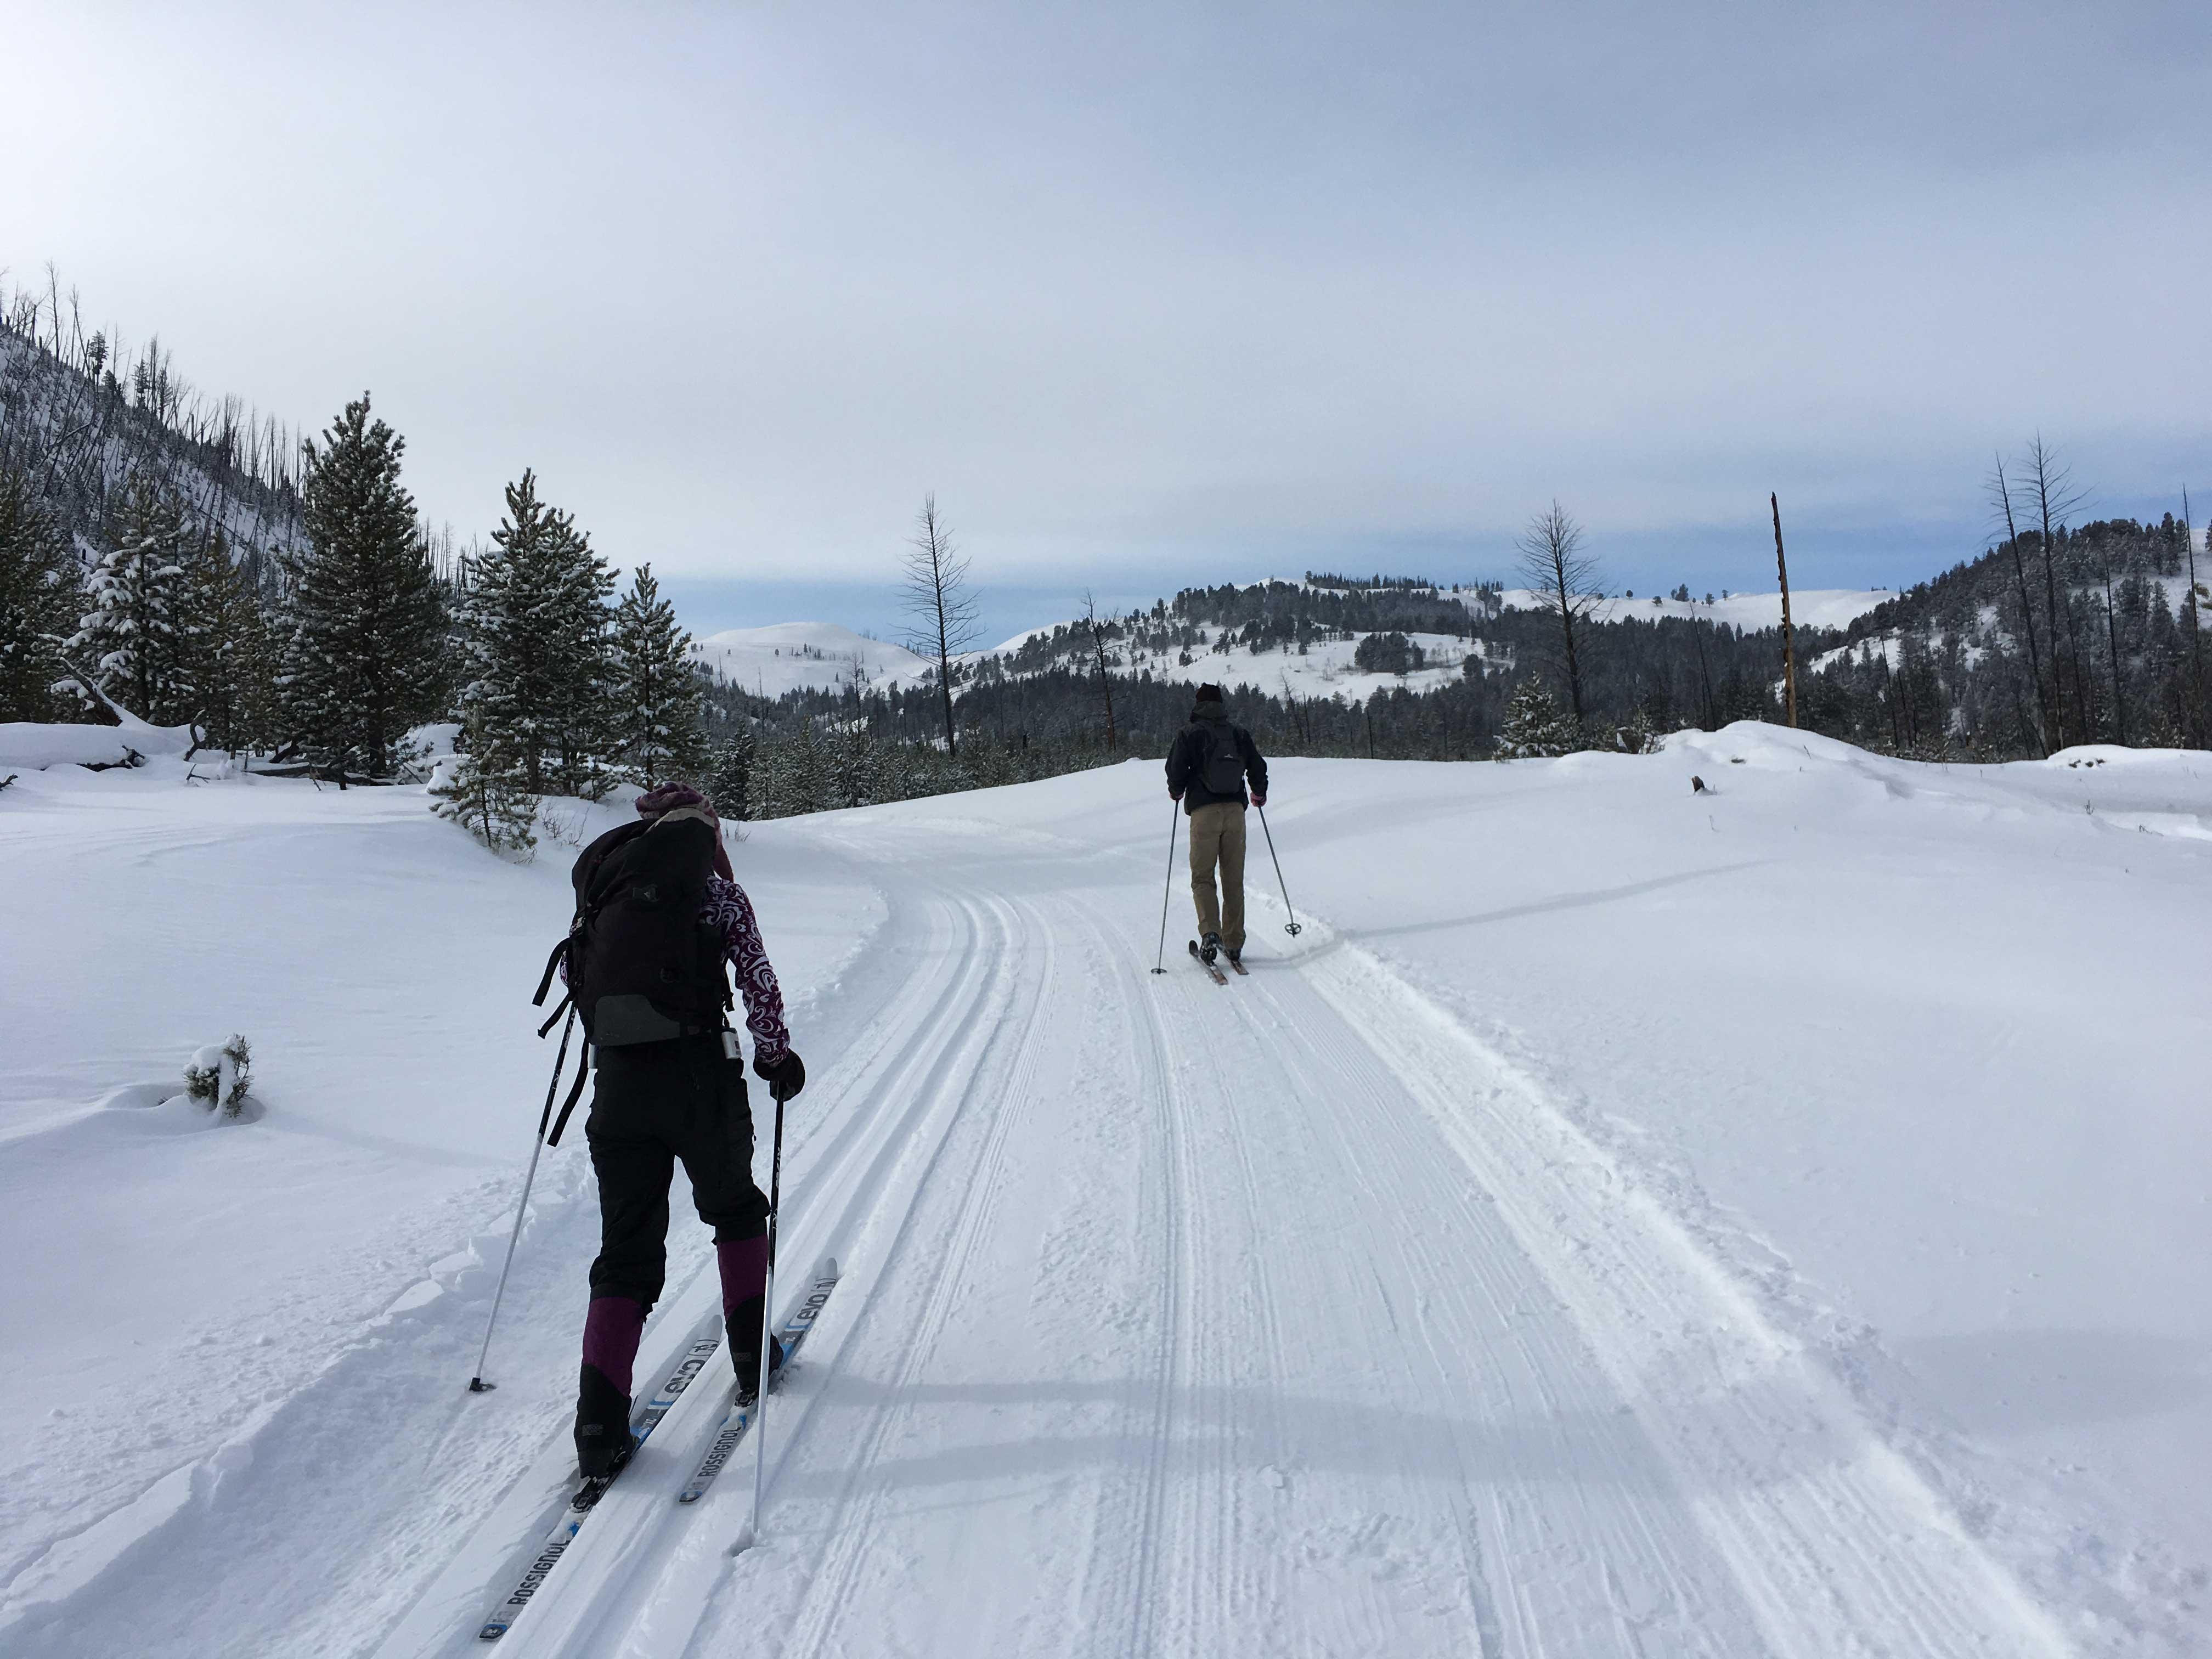 Blacktail Ski Trail